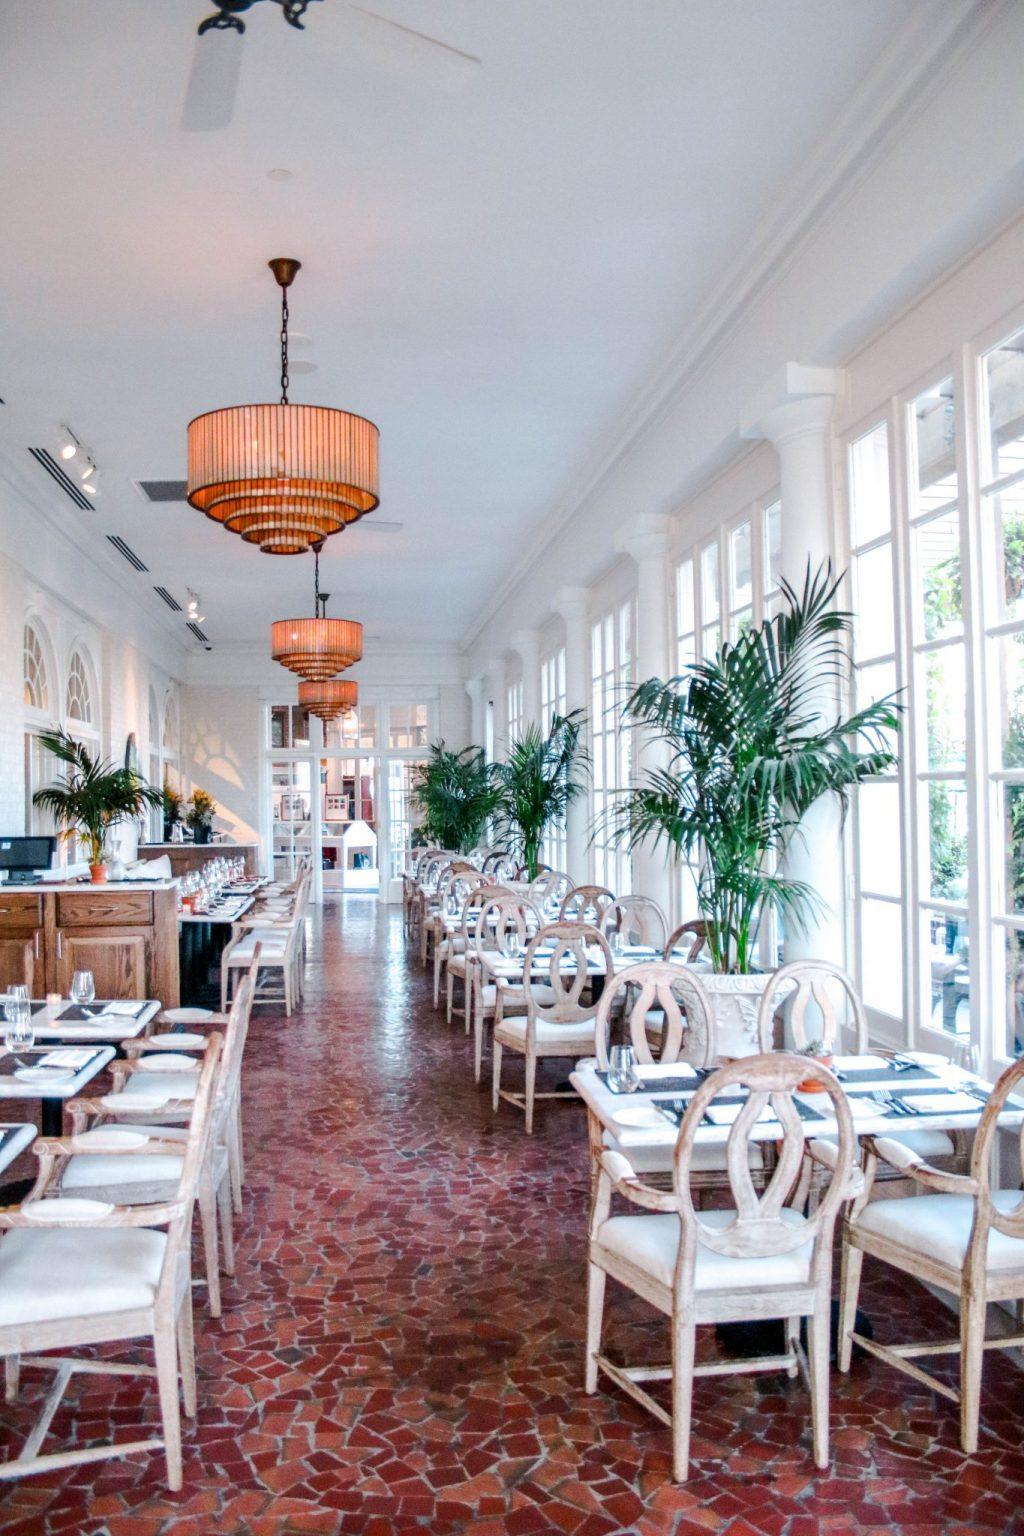 Becca Restaurant - The Cavalier Hotel